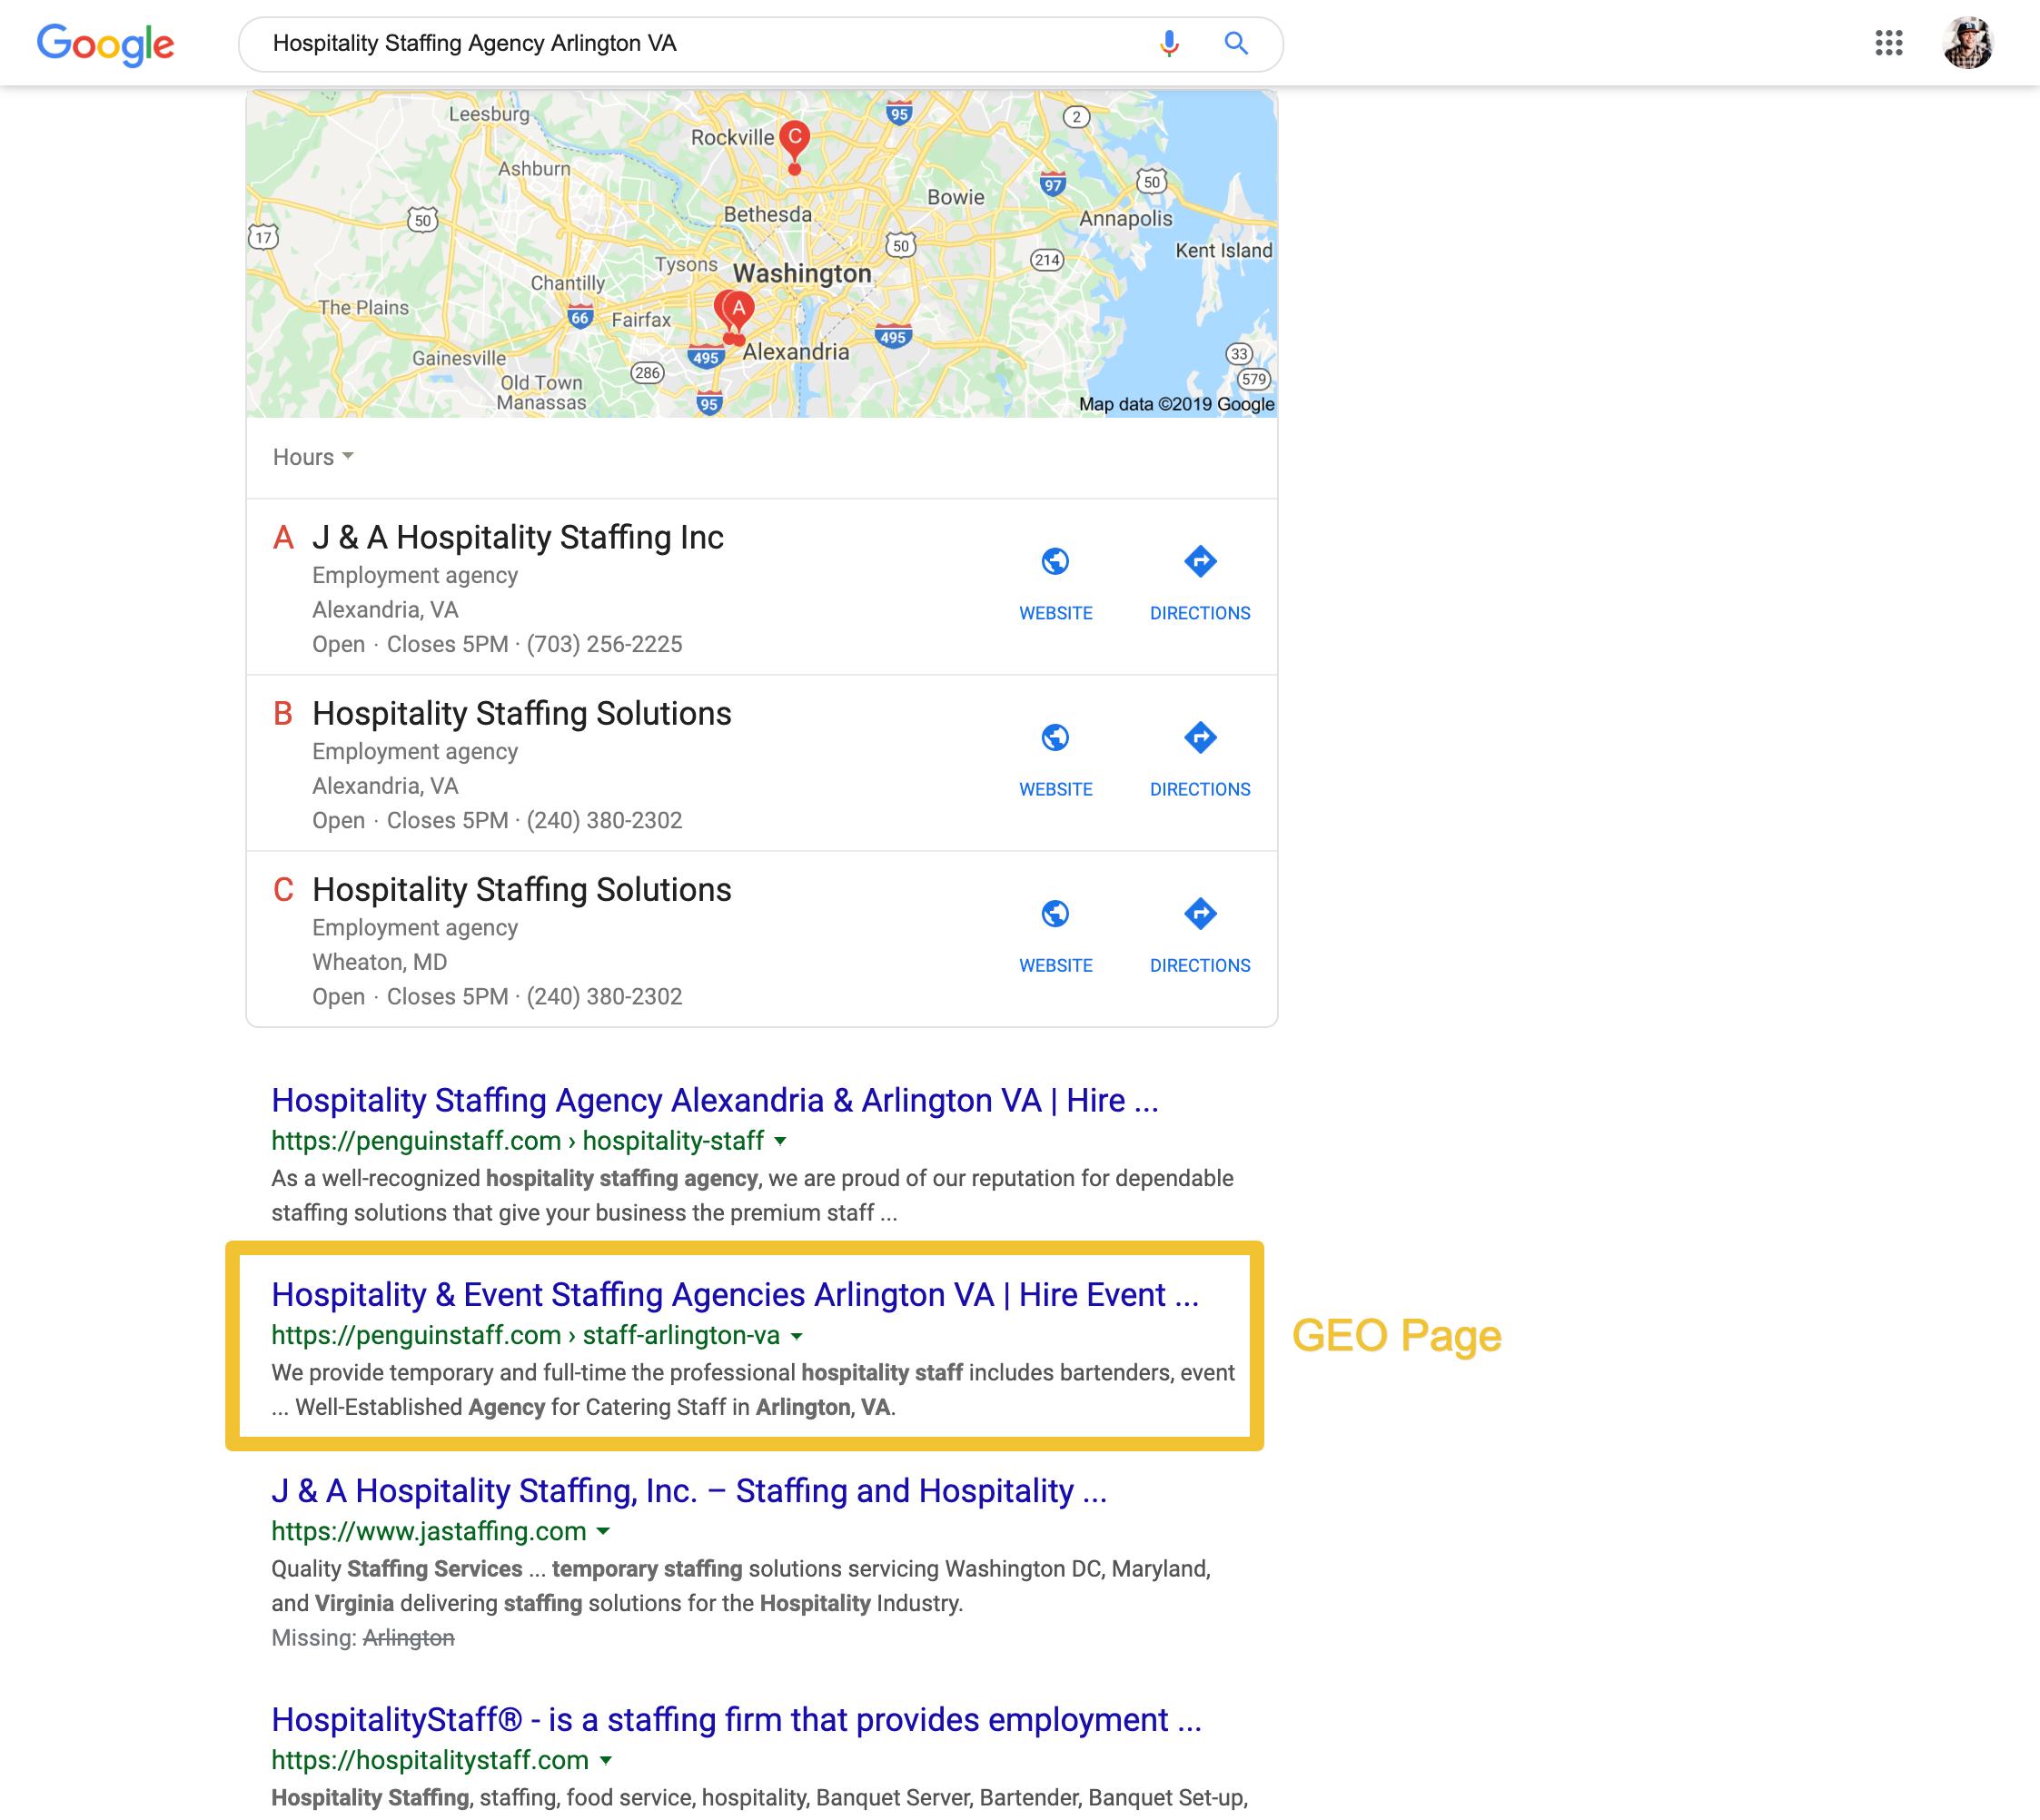 Hospitality Staffing Agency Arlington VA - Google Search